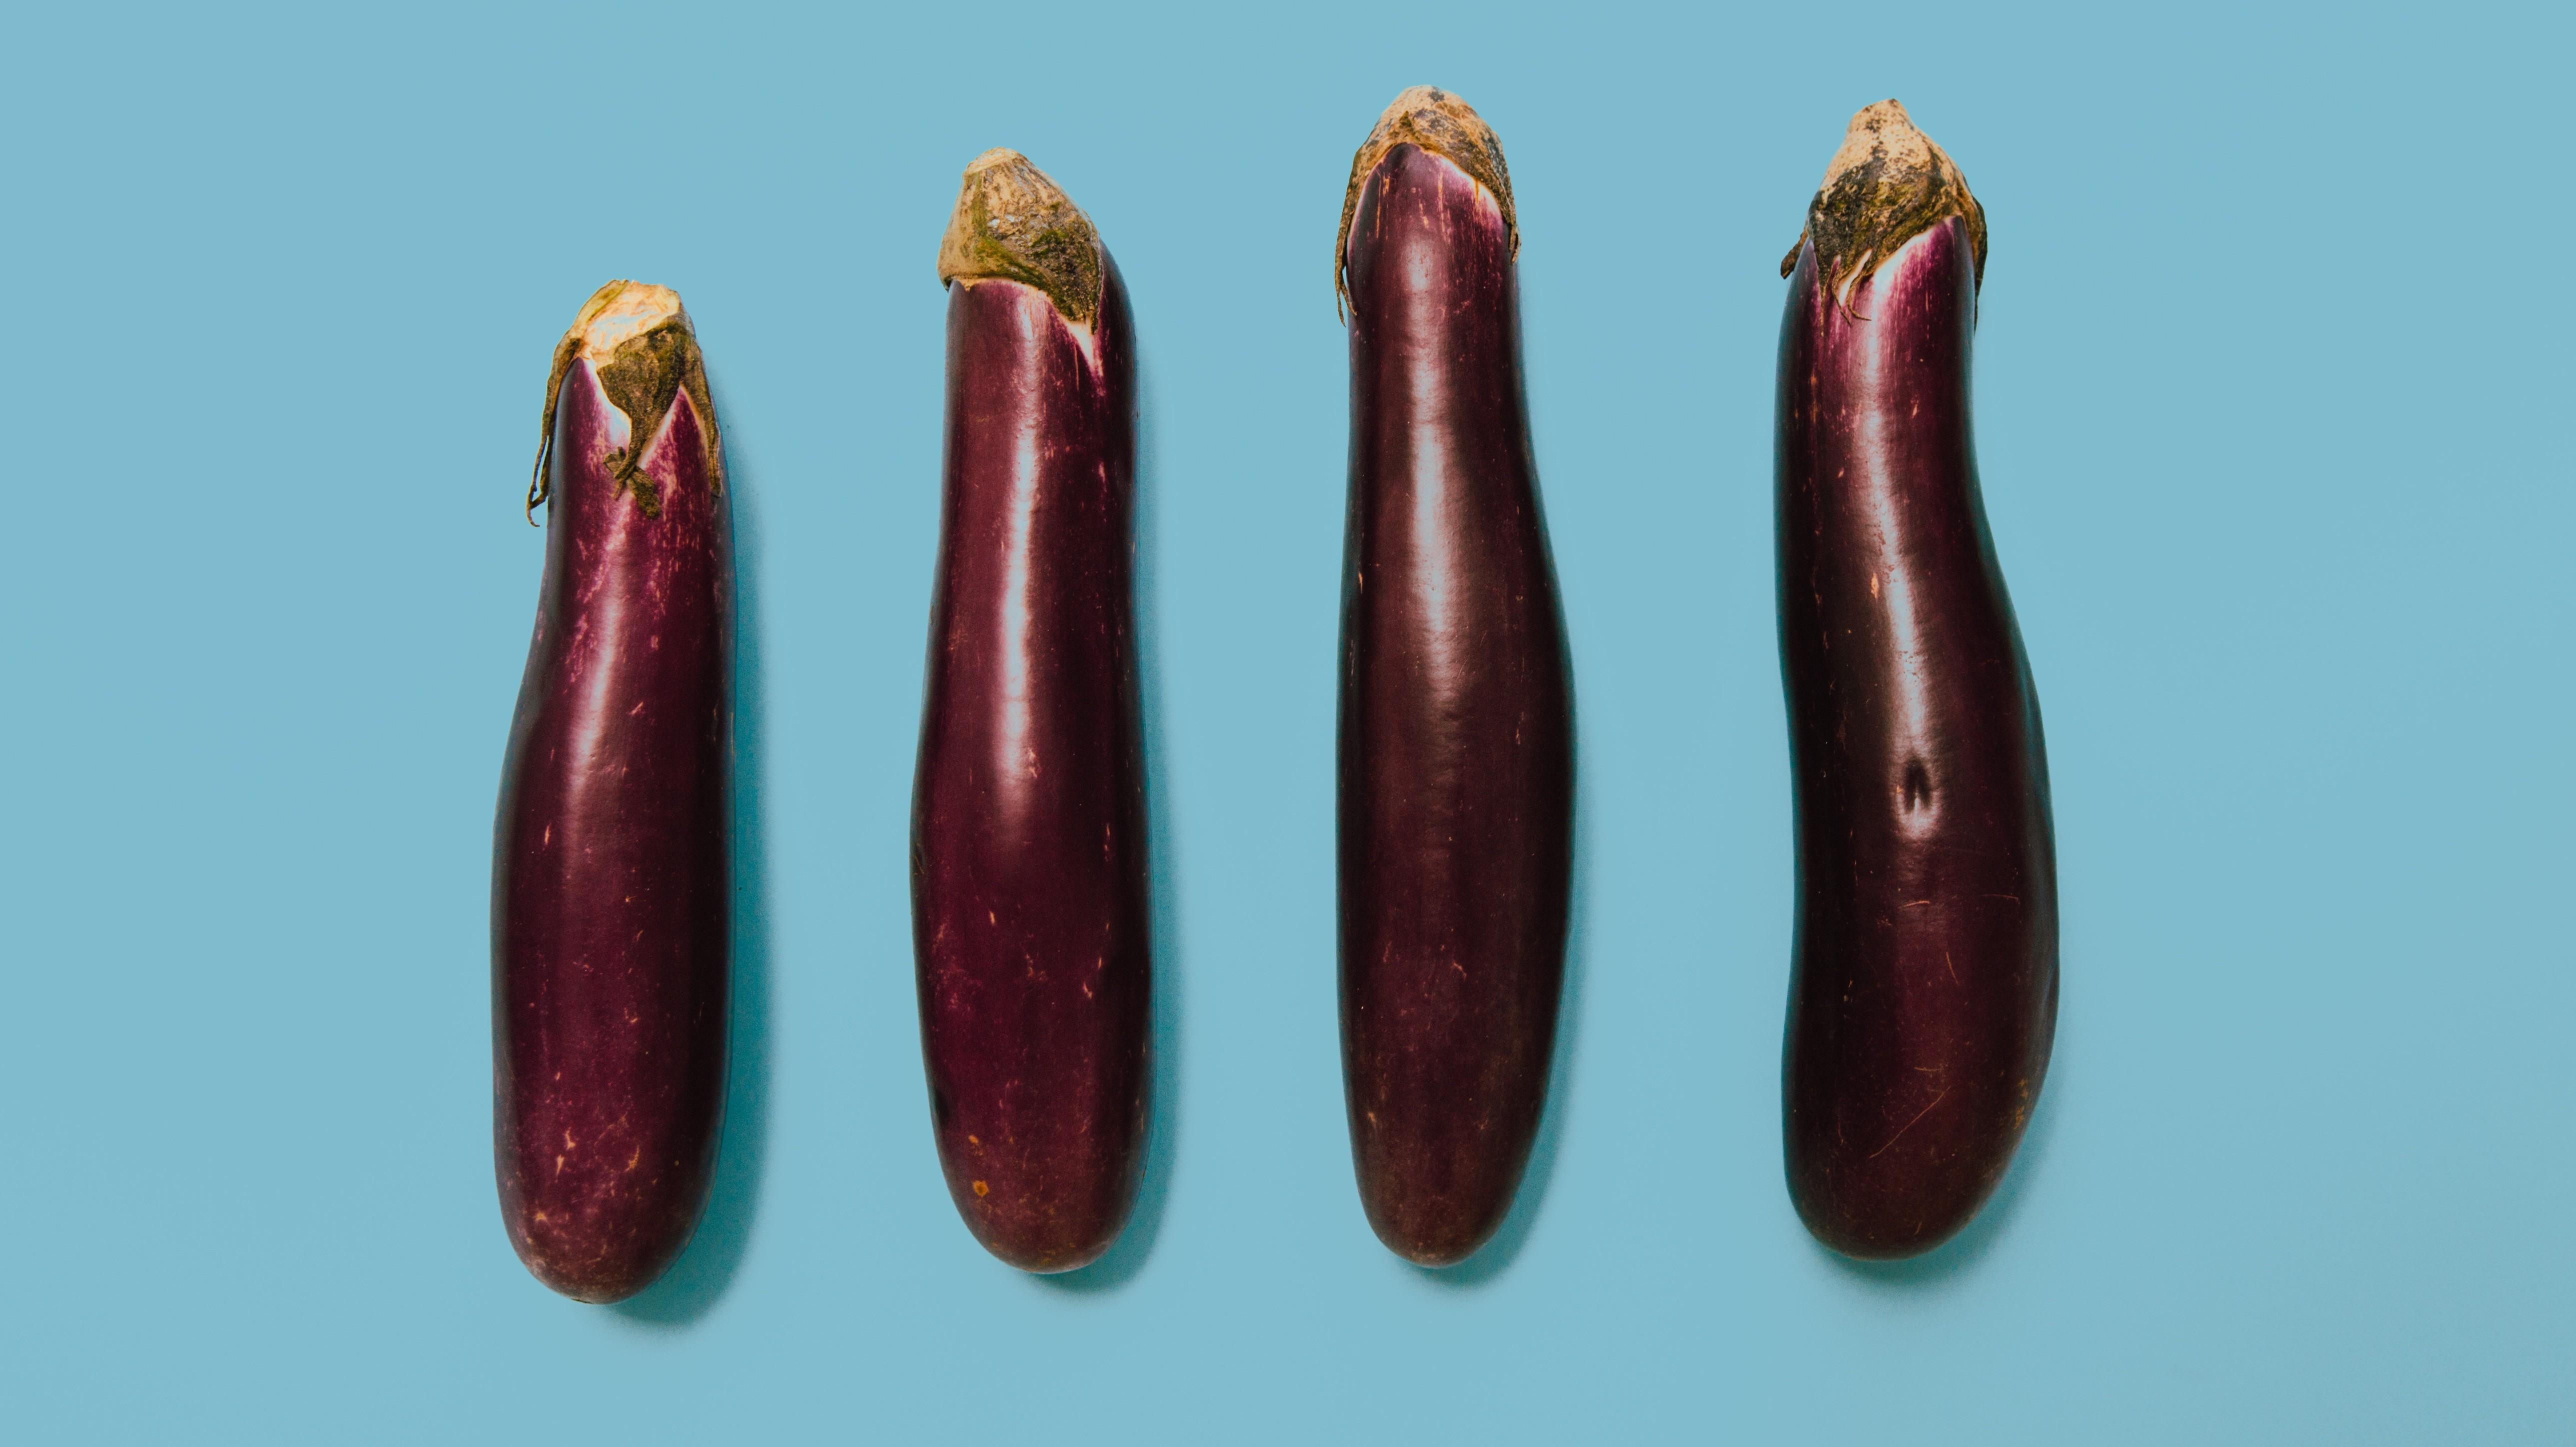 chili și erecție penis de lungime medie erect